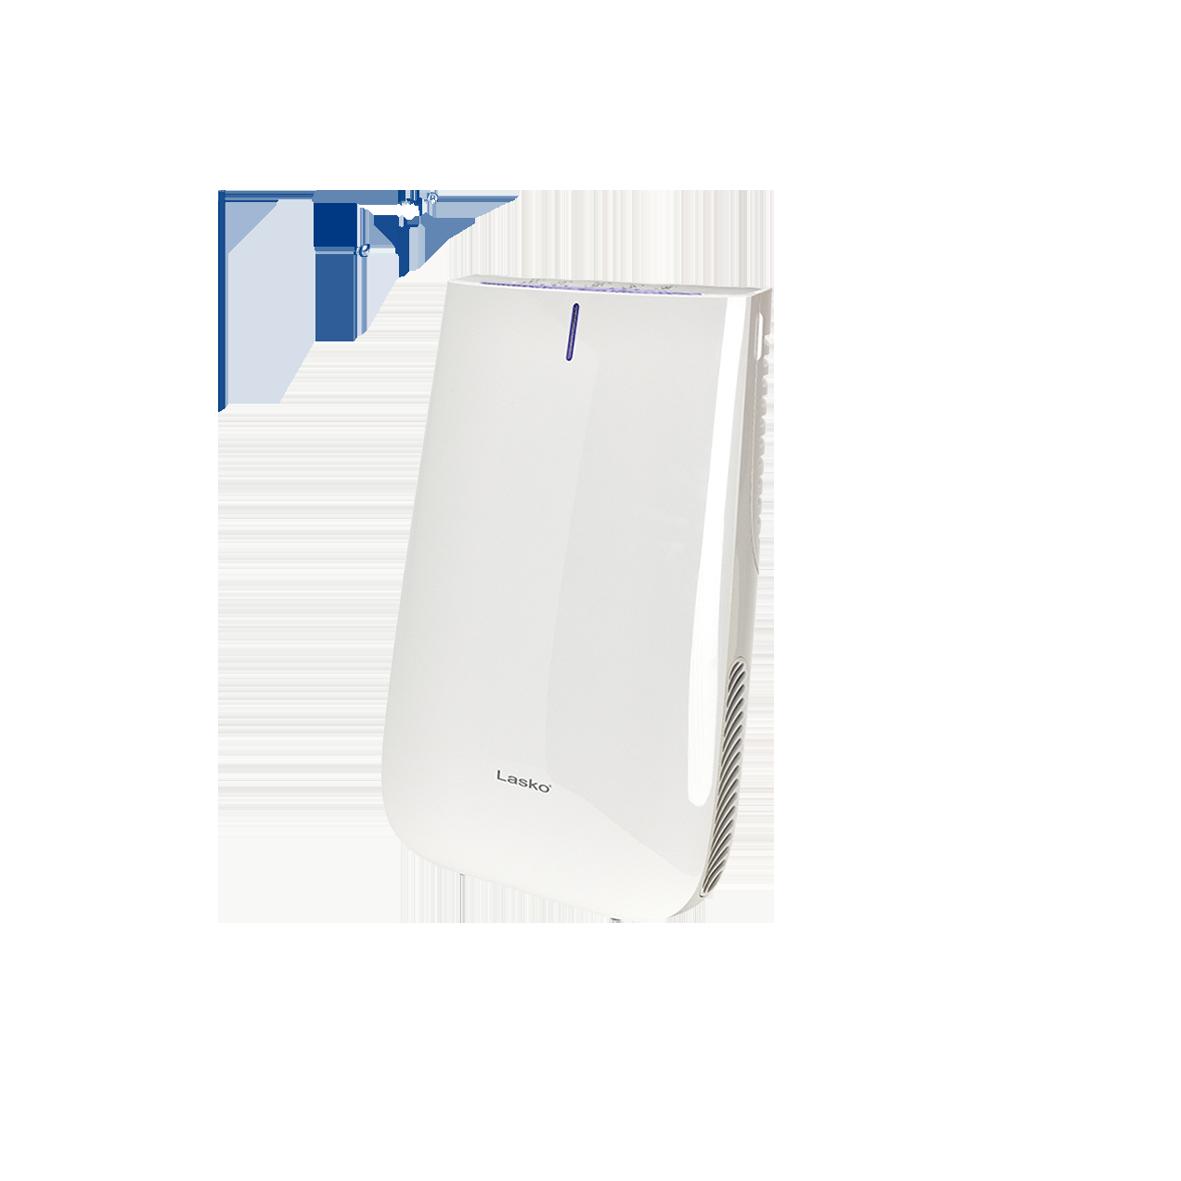 LASKO / 白朗峰 智能雲端超薄空氣清淨機(HF25640TW)